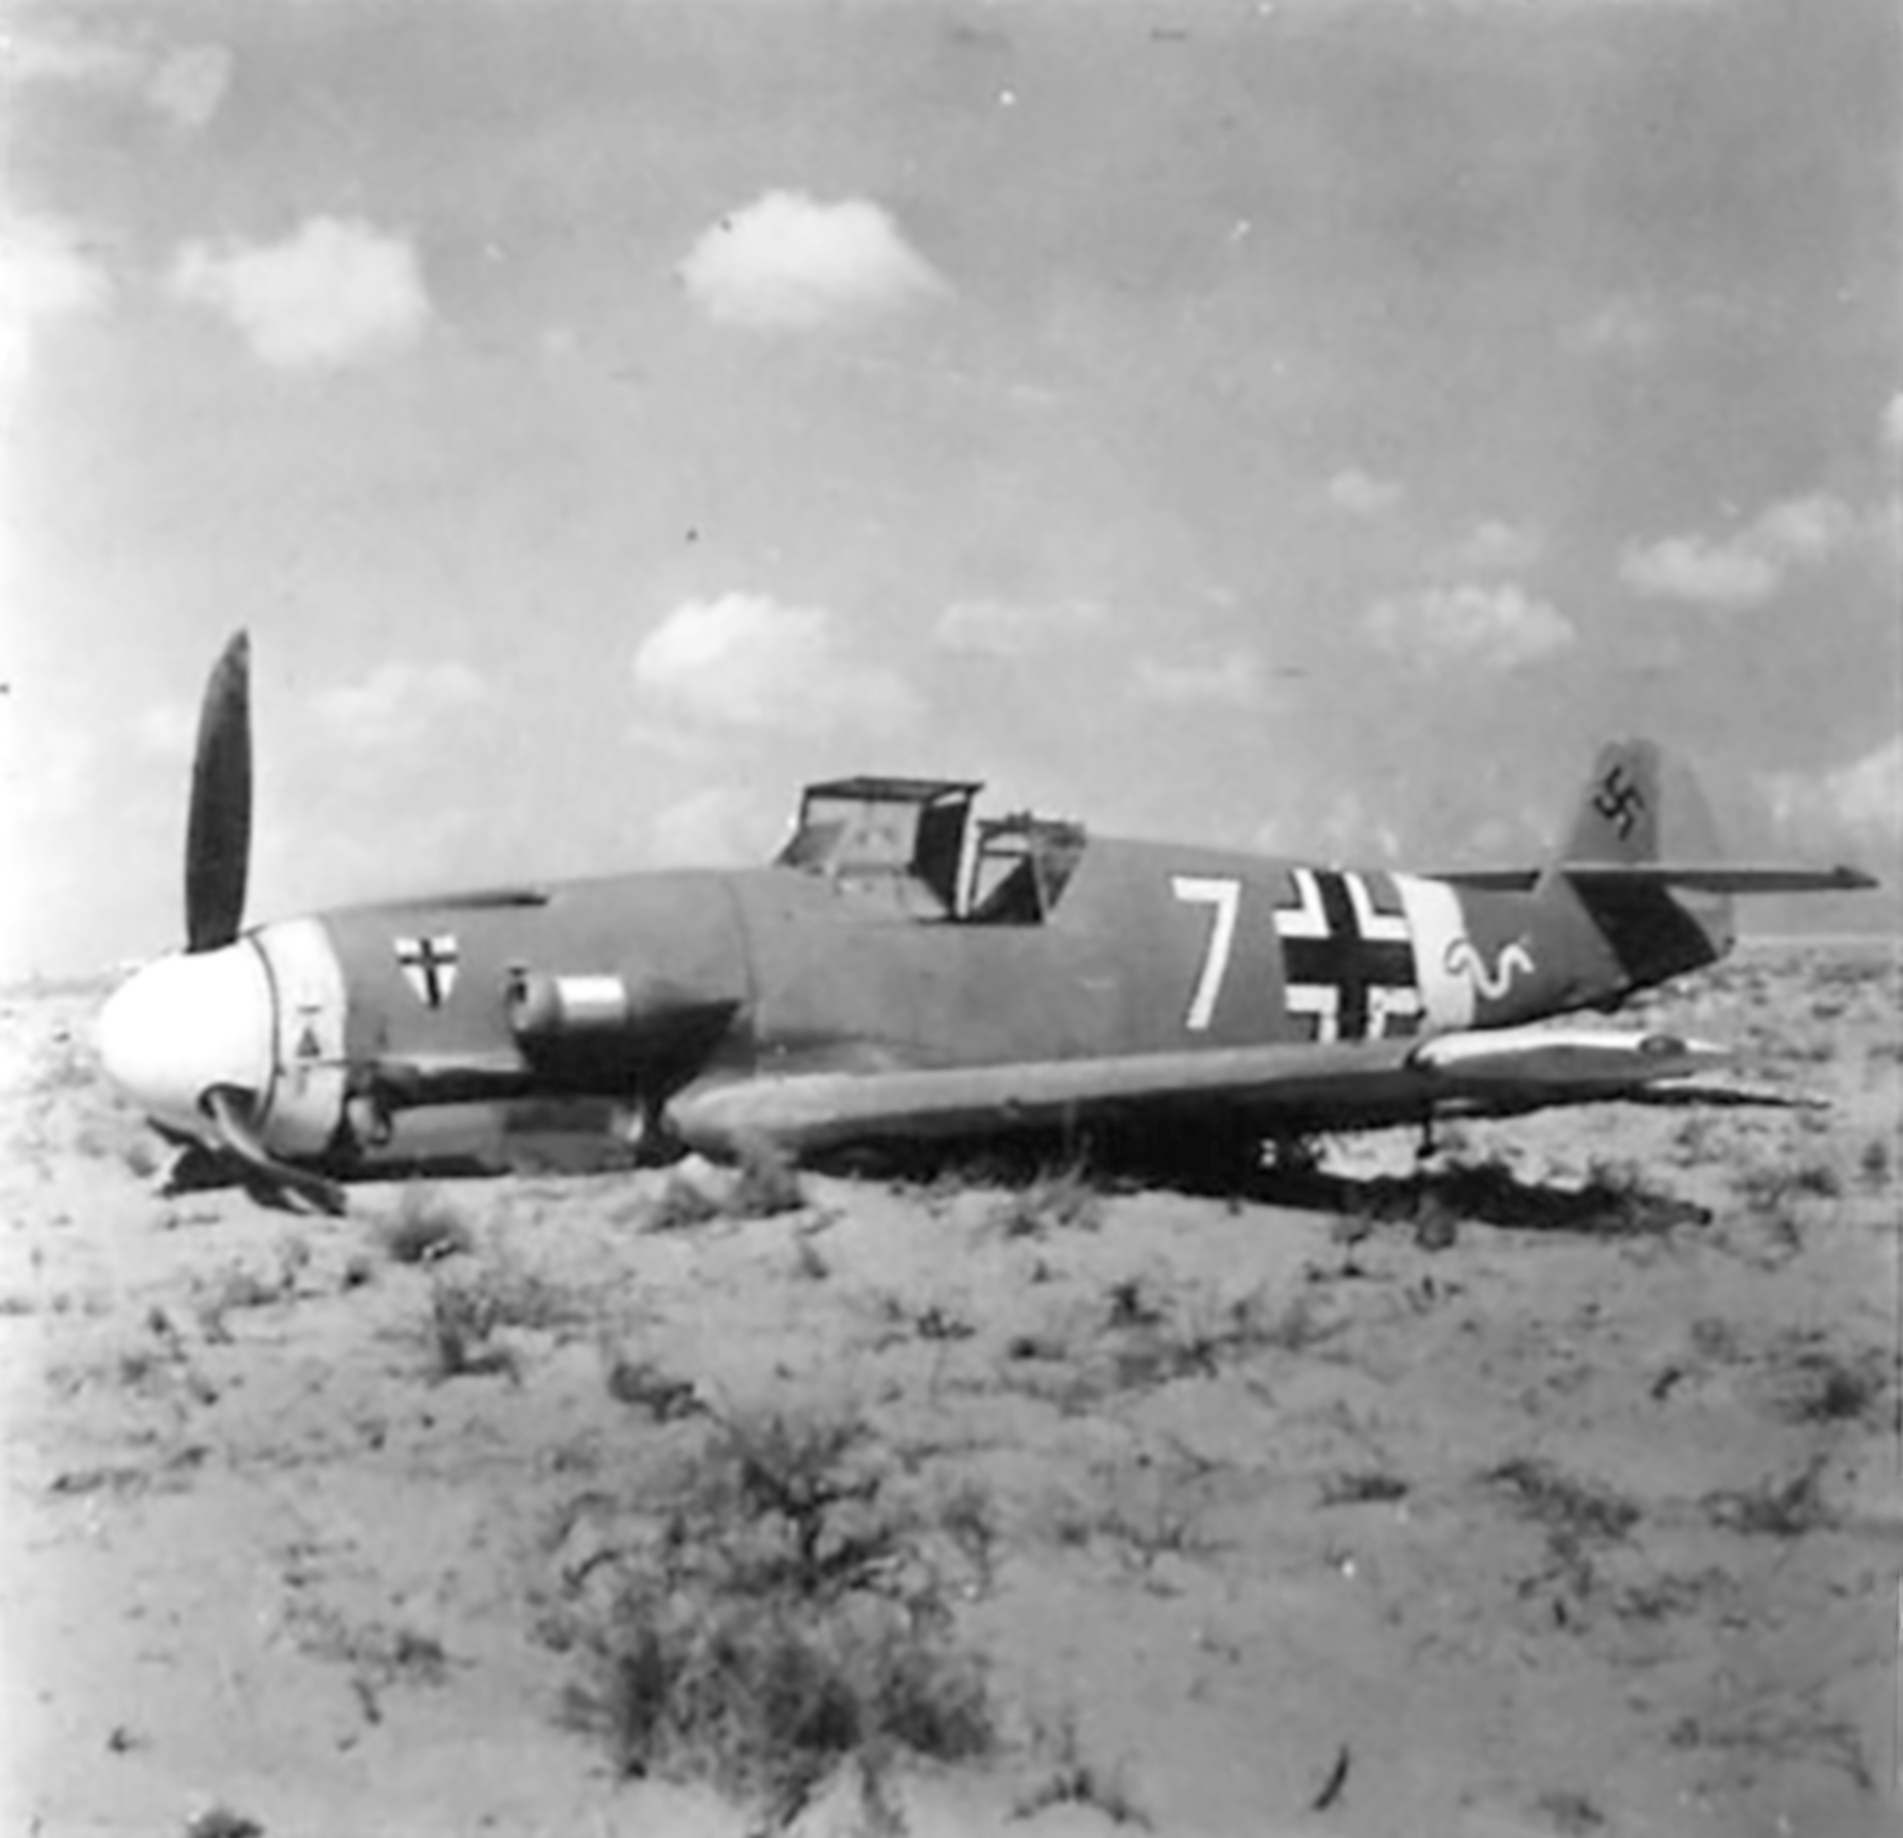 Messerschmitt Bf 109F4Trop 9.JG27 Yellow 7 Helmuth Fenzl WNr 13136 crash Egypt 26th Oct 1942 05